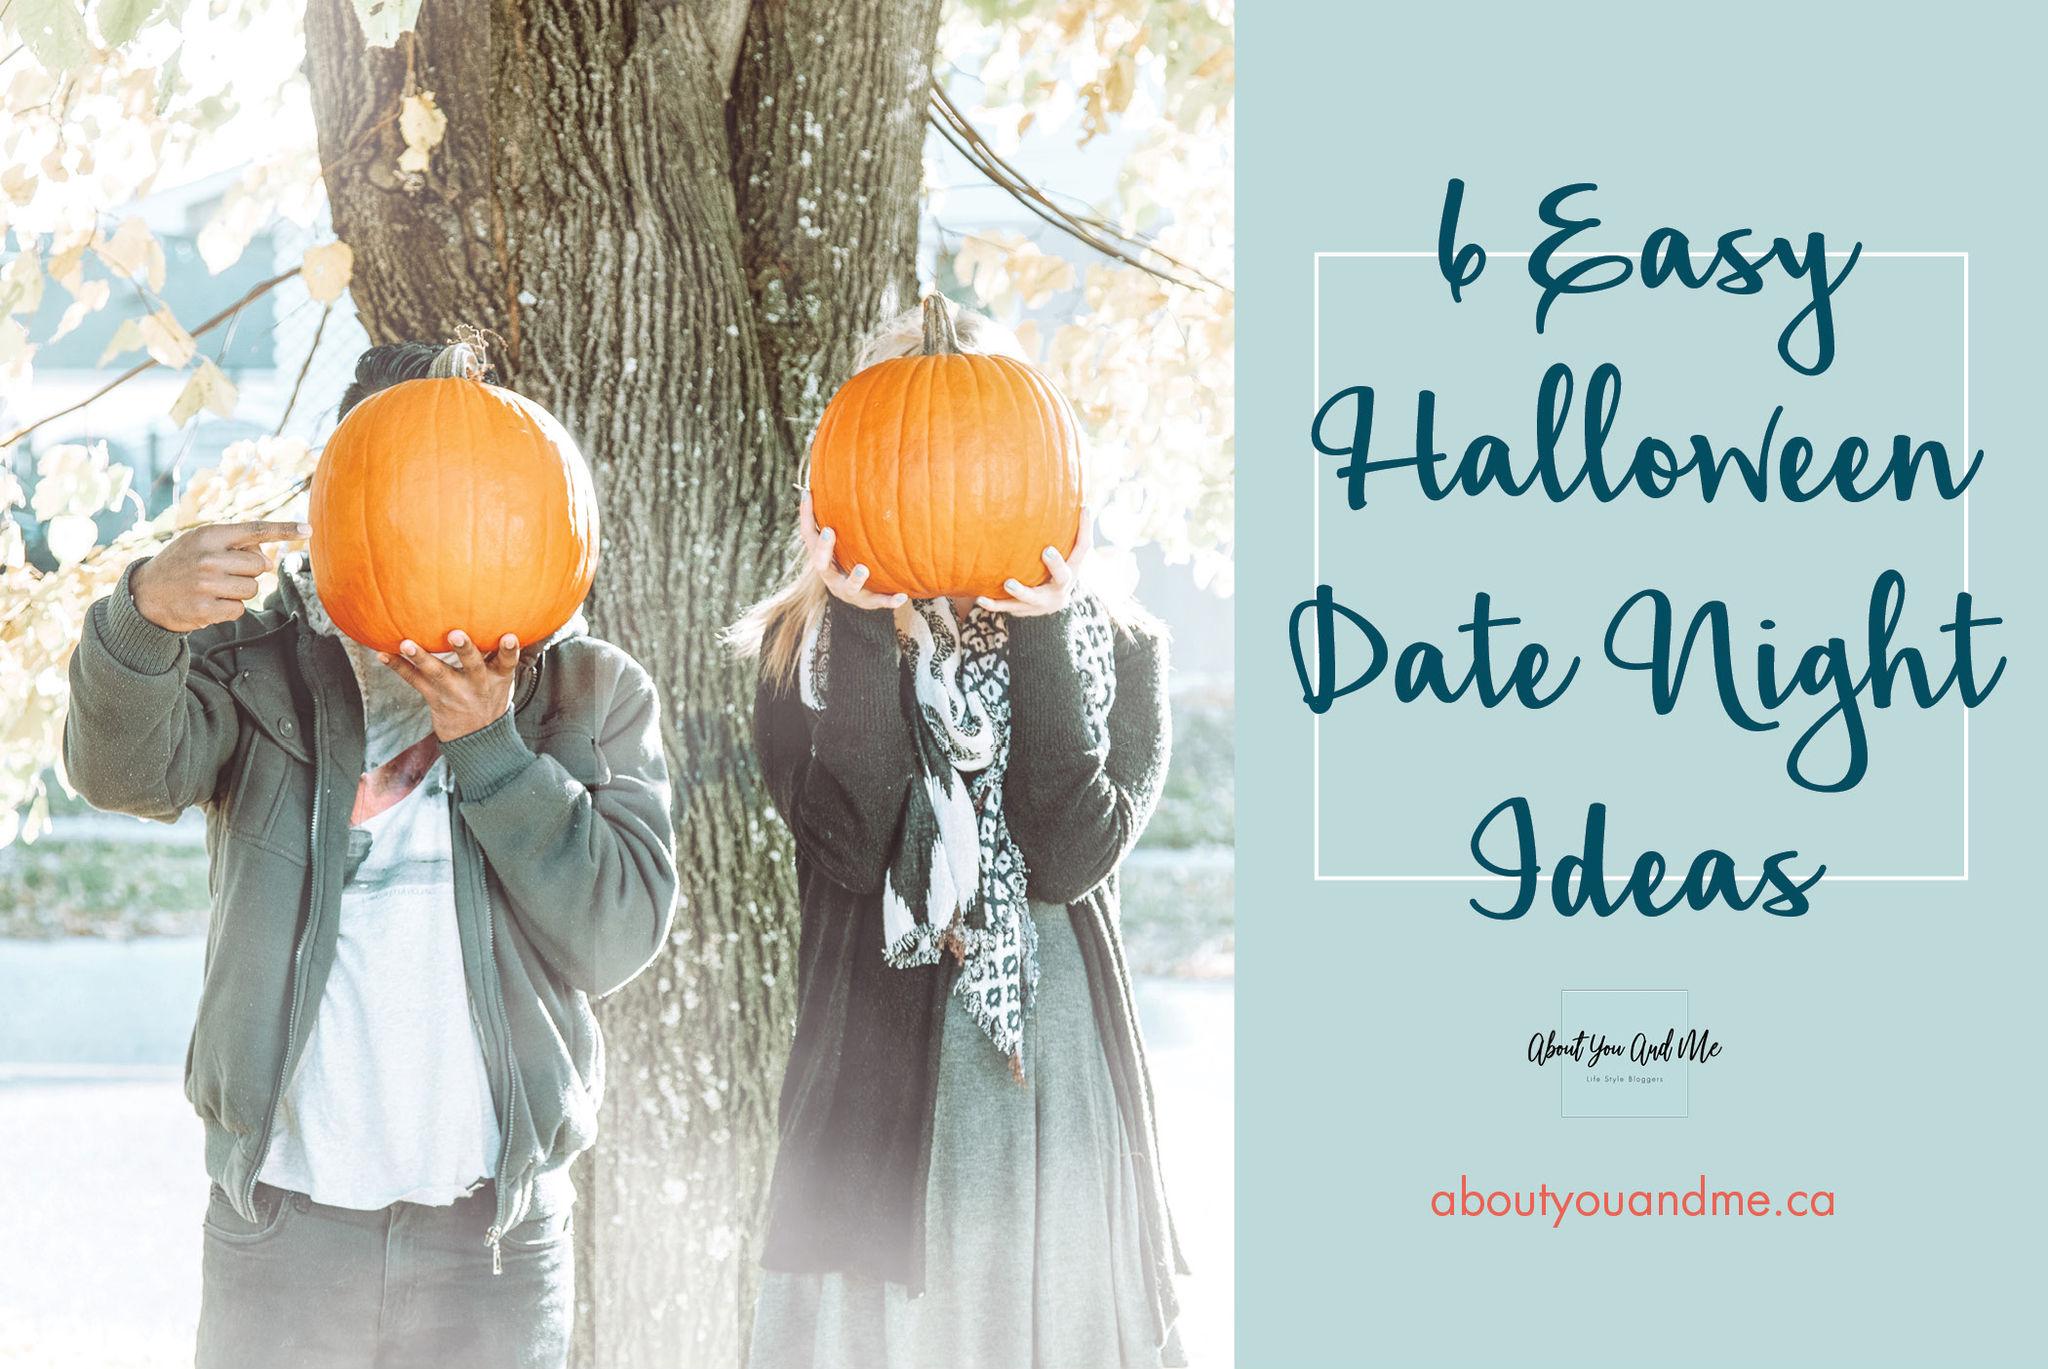 6 easy halloween date night ideas